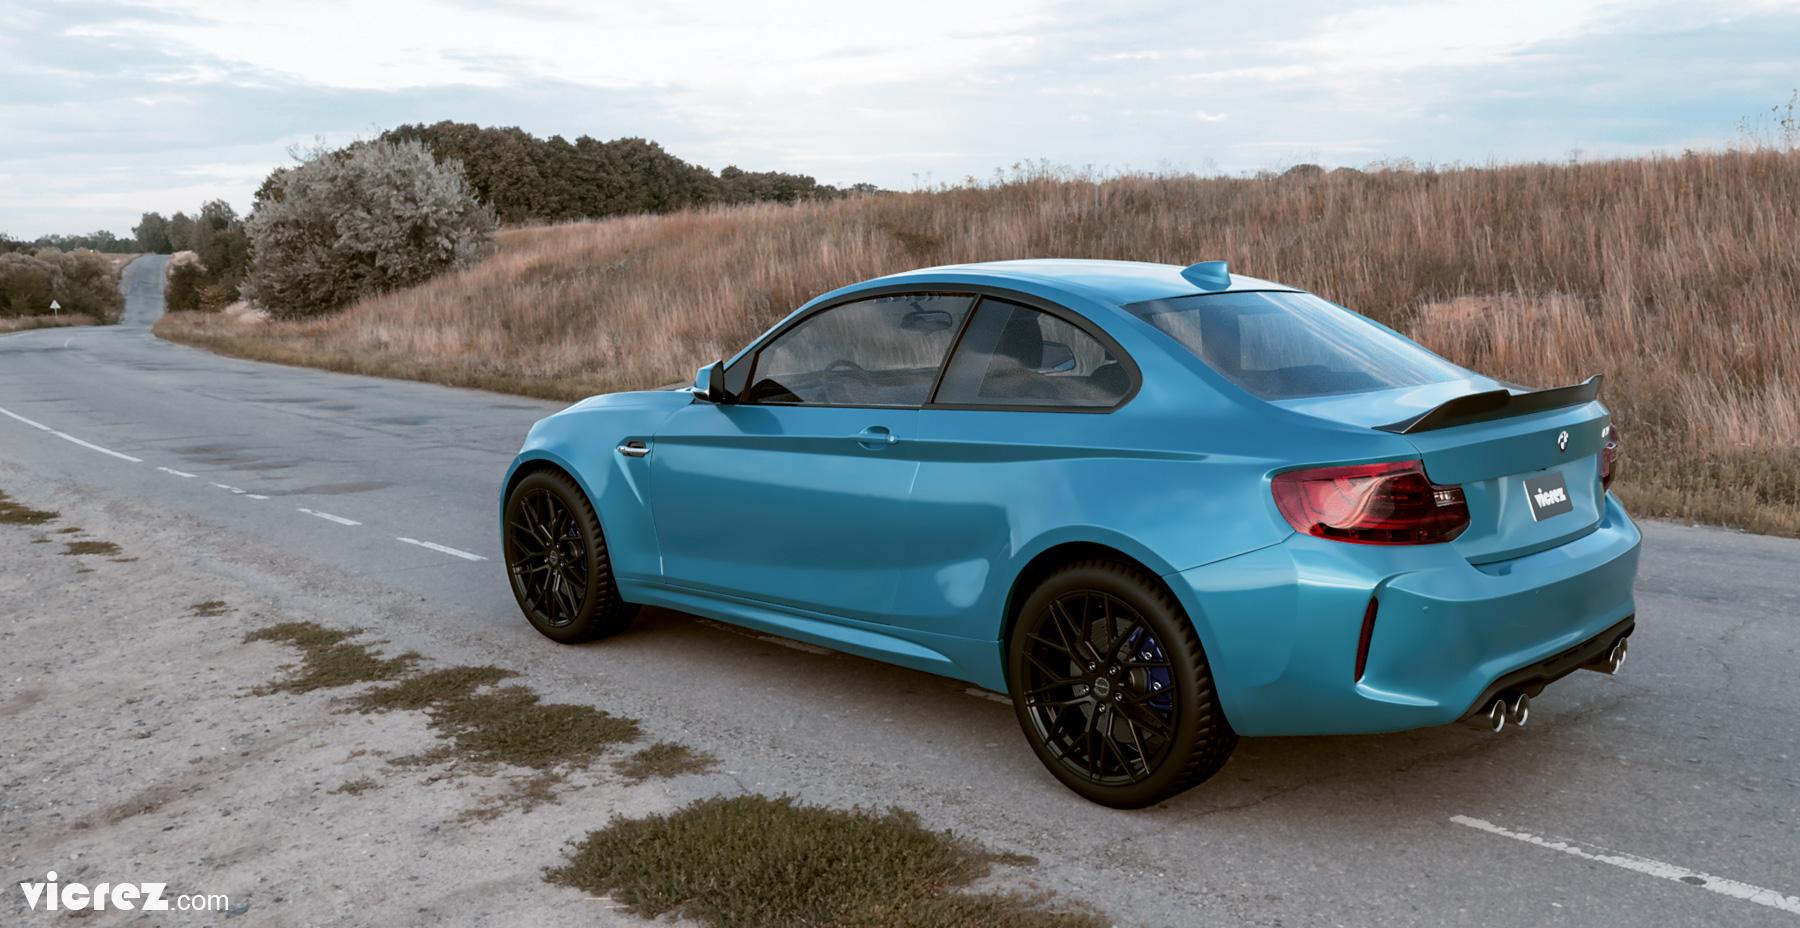 Vicrez BMW M2 F87 2016-2019 V3R Carbon Fiber Rear Wing Spoiler vz101026